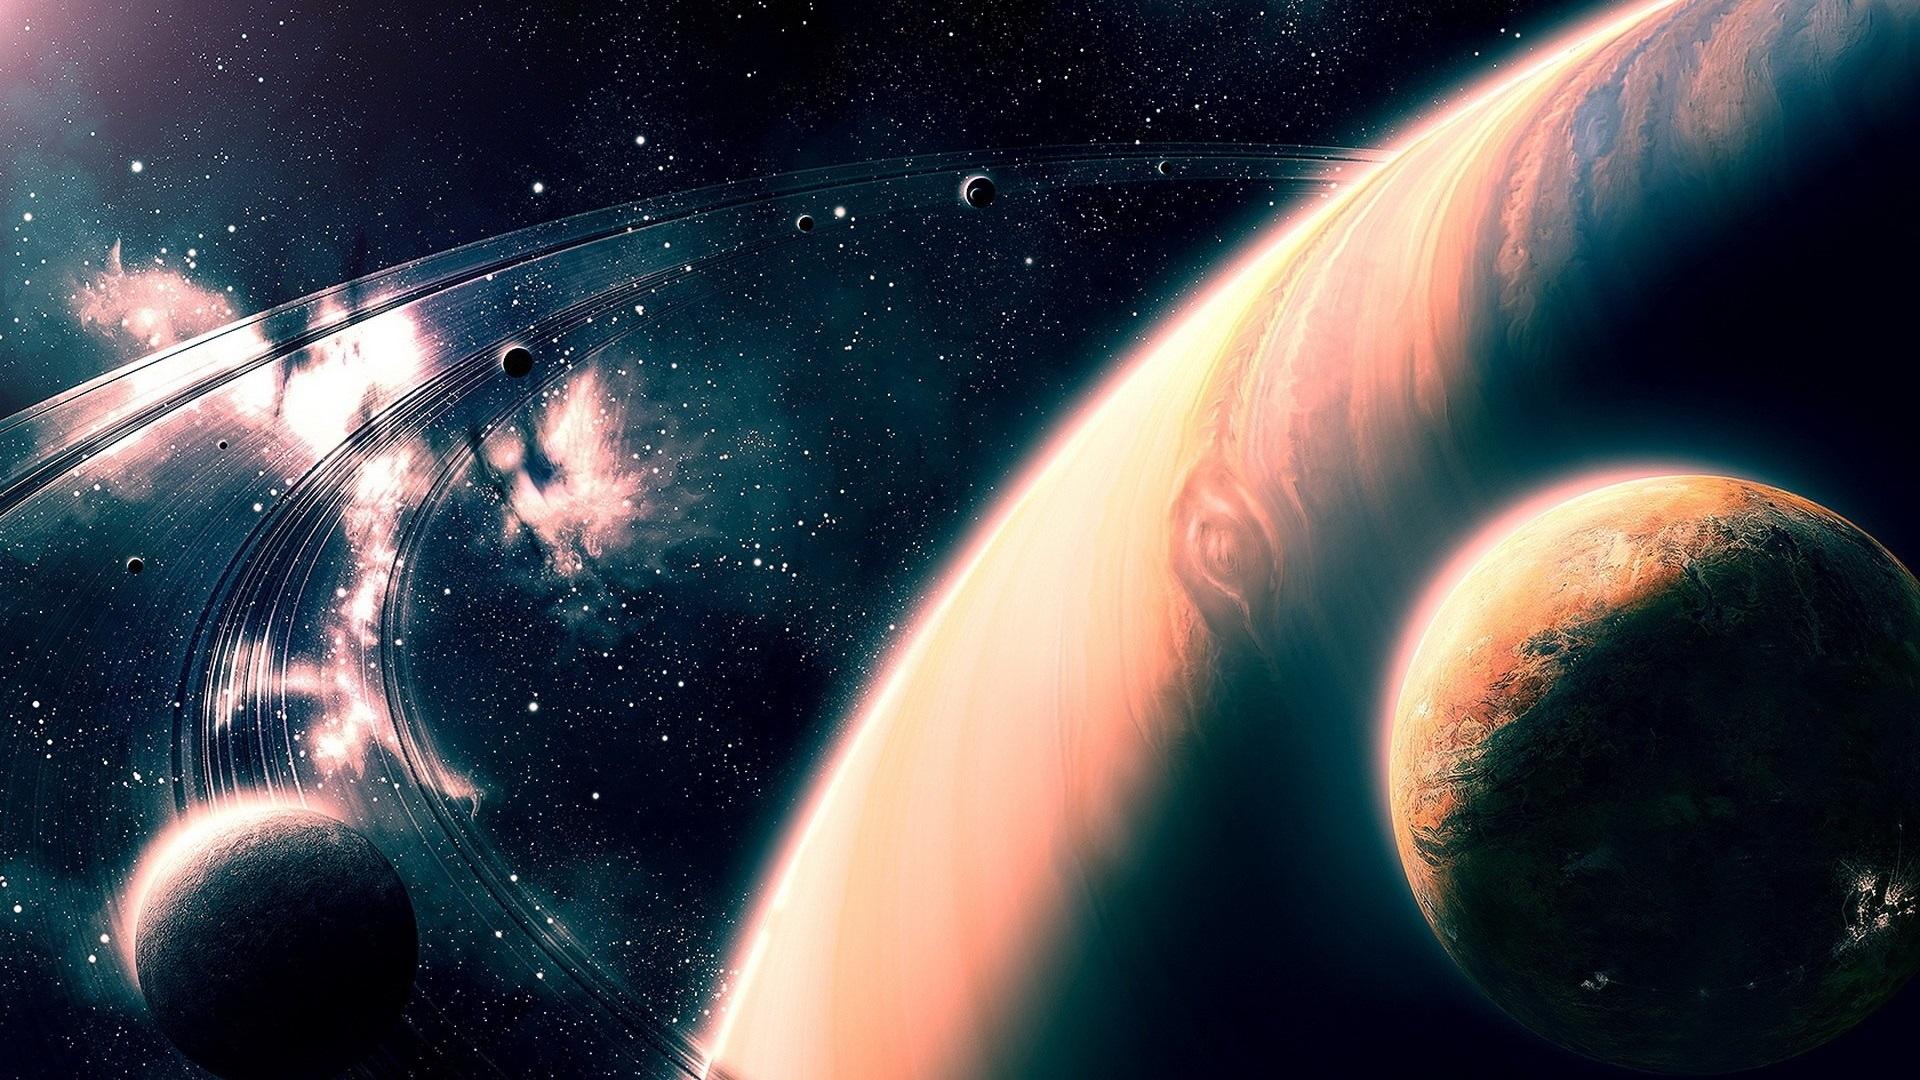 Hermoso Universo, Planetas, Estrellas Fondos De Pantalla